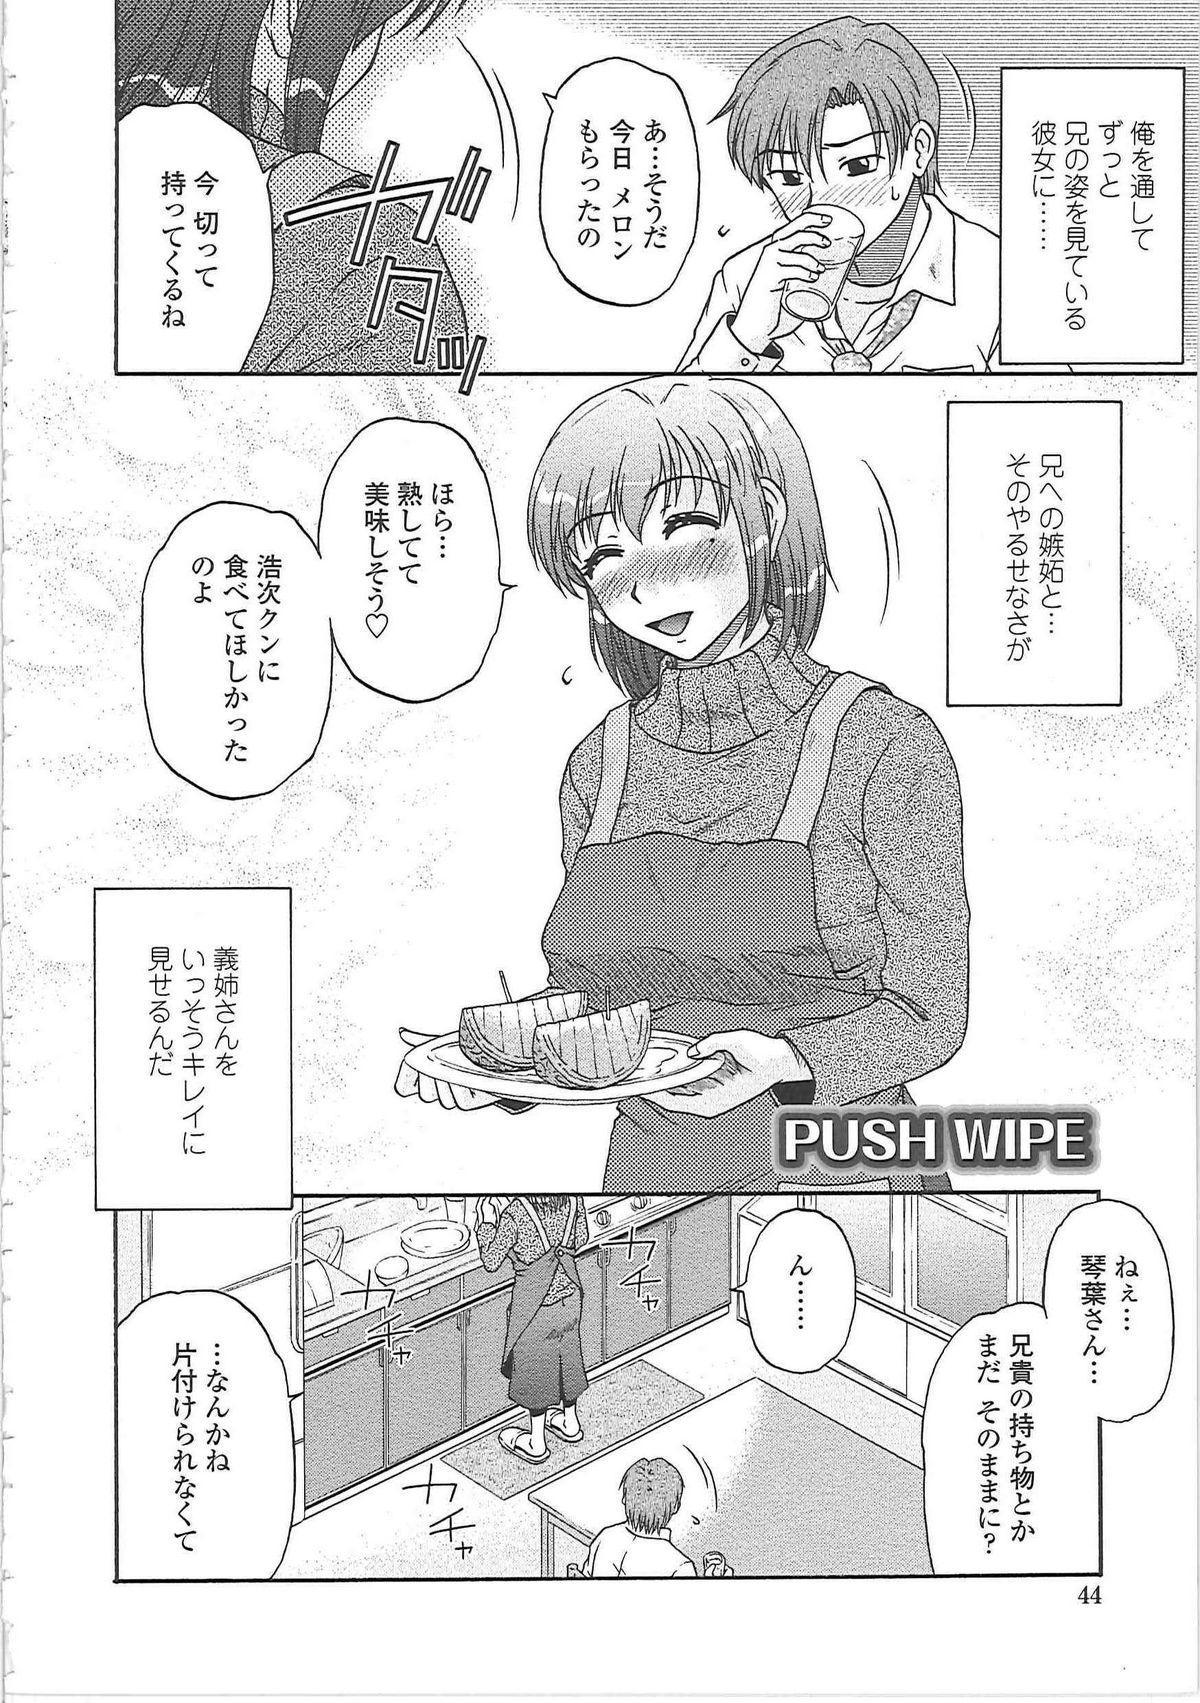 Nikuzuma Tsuushin - Erotic Wife Communication 48